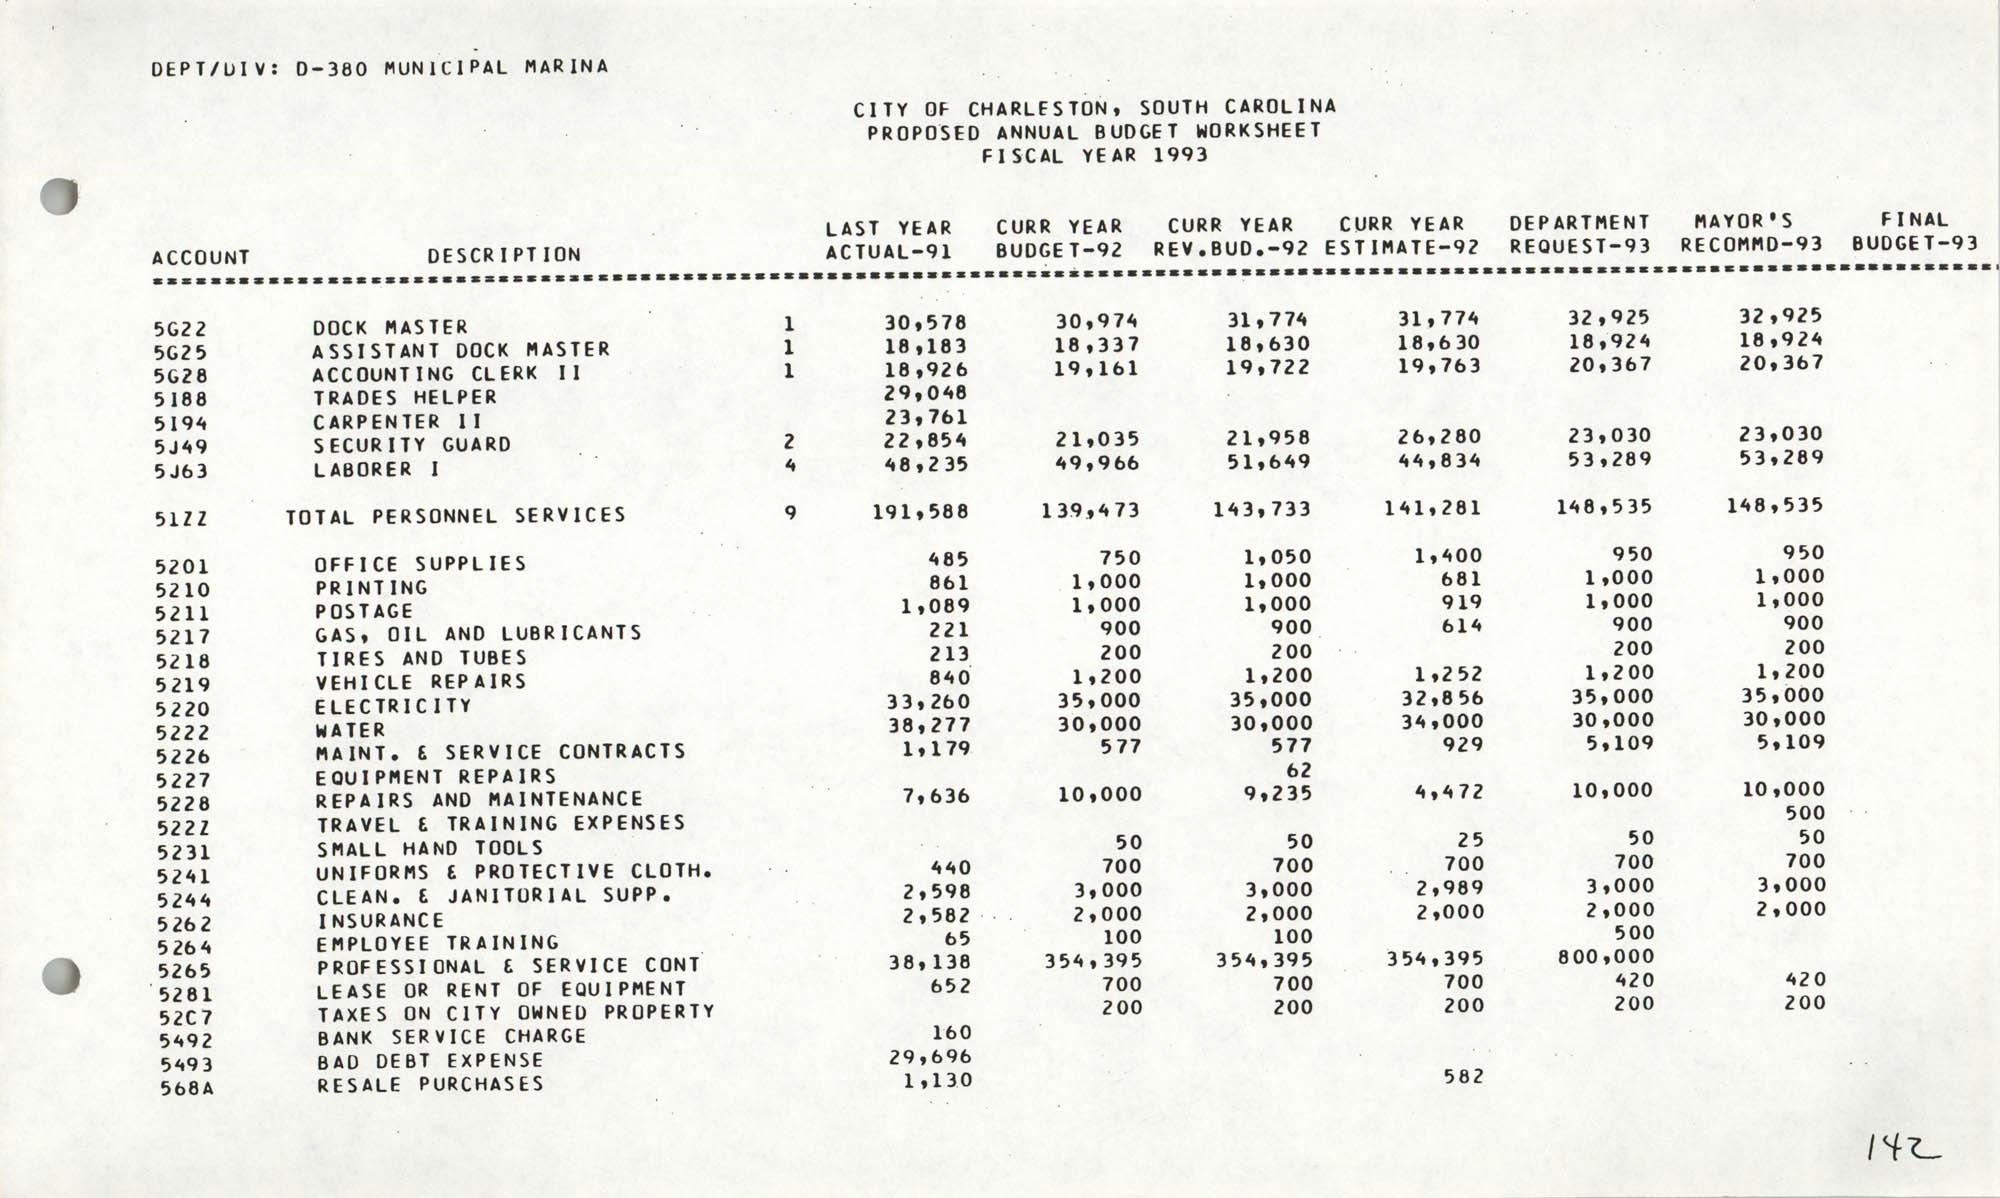 The City Council of Charleston, South Carolina, 1993 Budget, Page 142